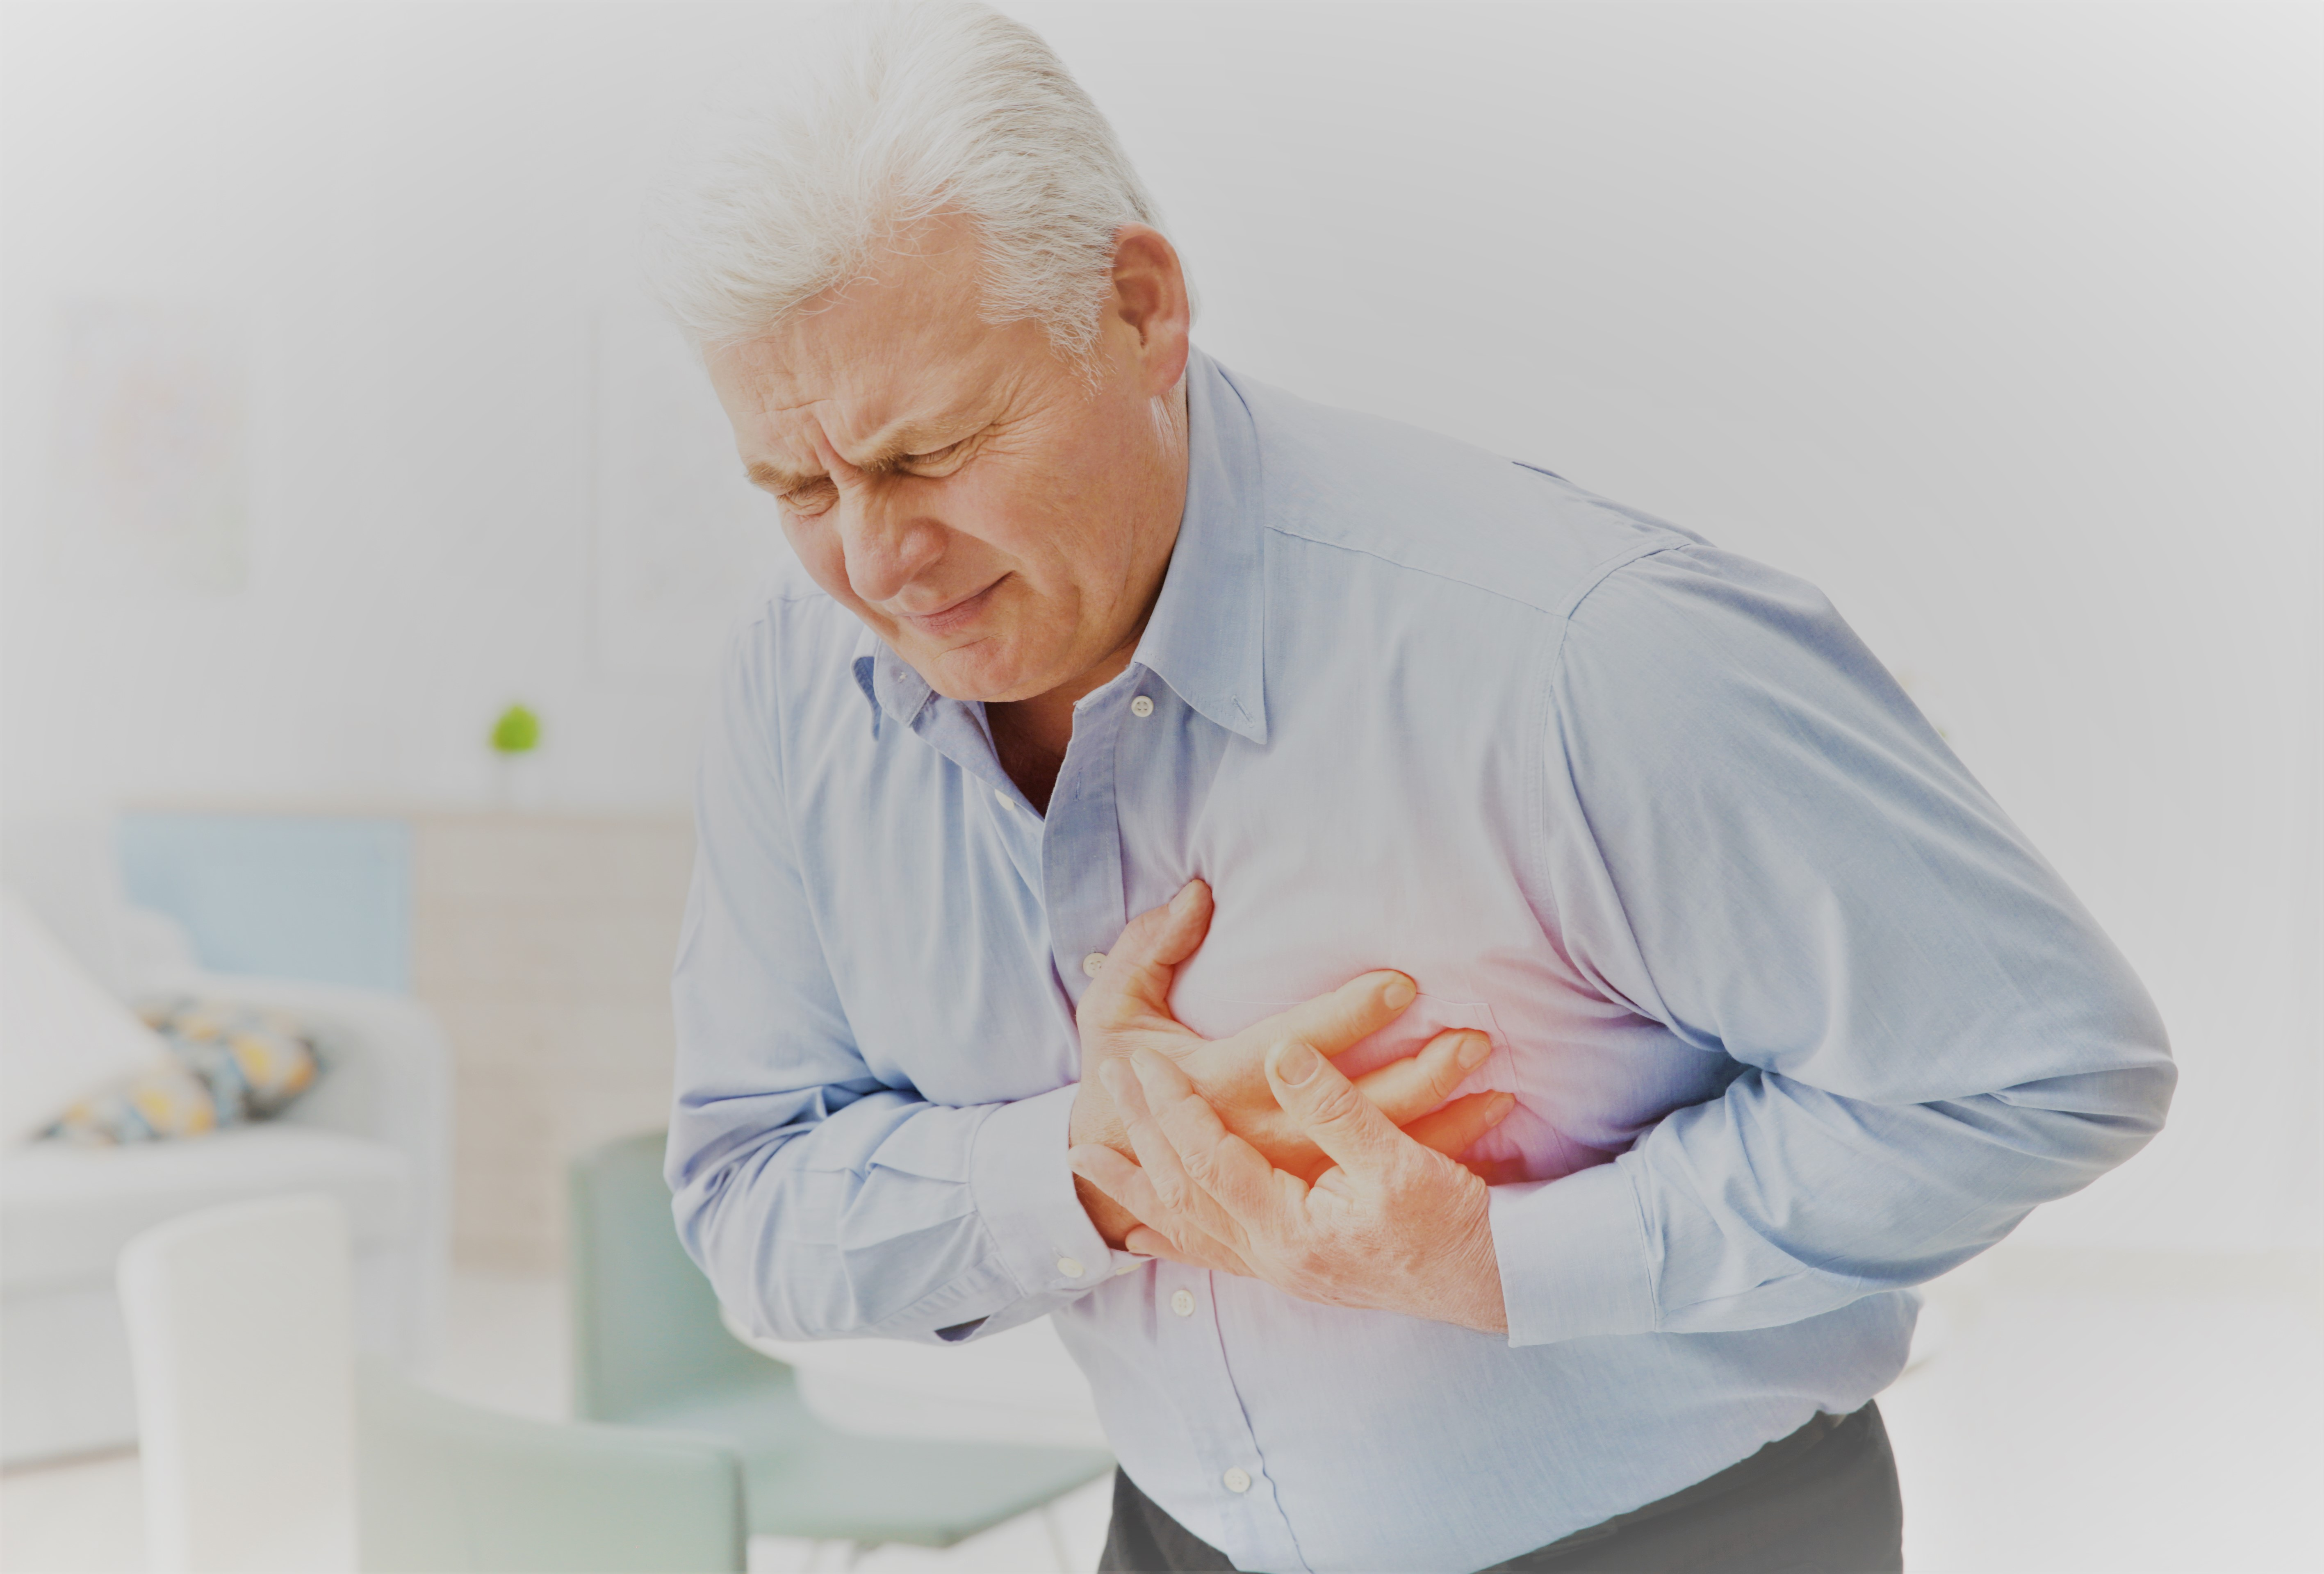 magas vérnyomás, de szívfájdalom coca cola magas vérnyomás